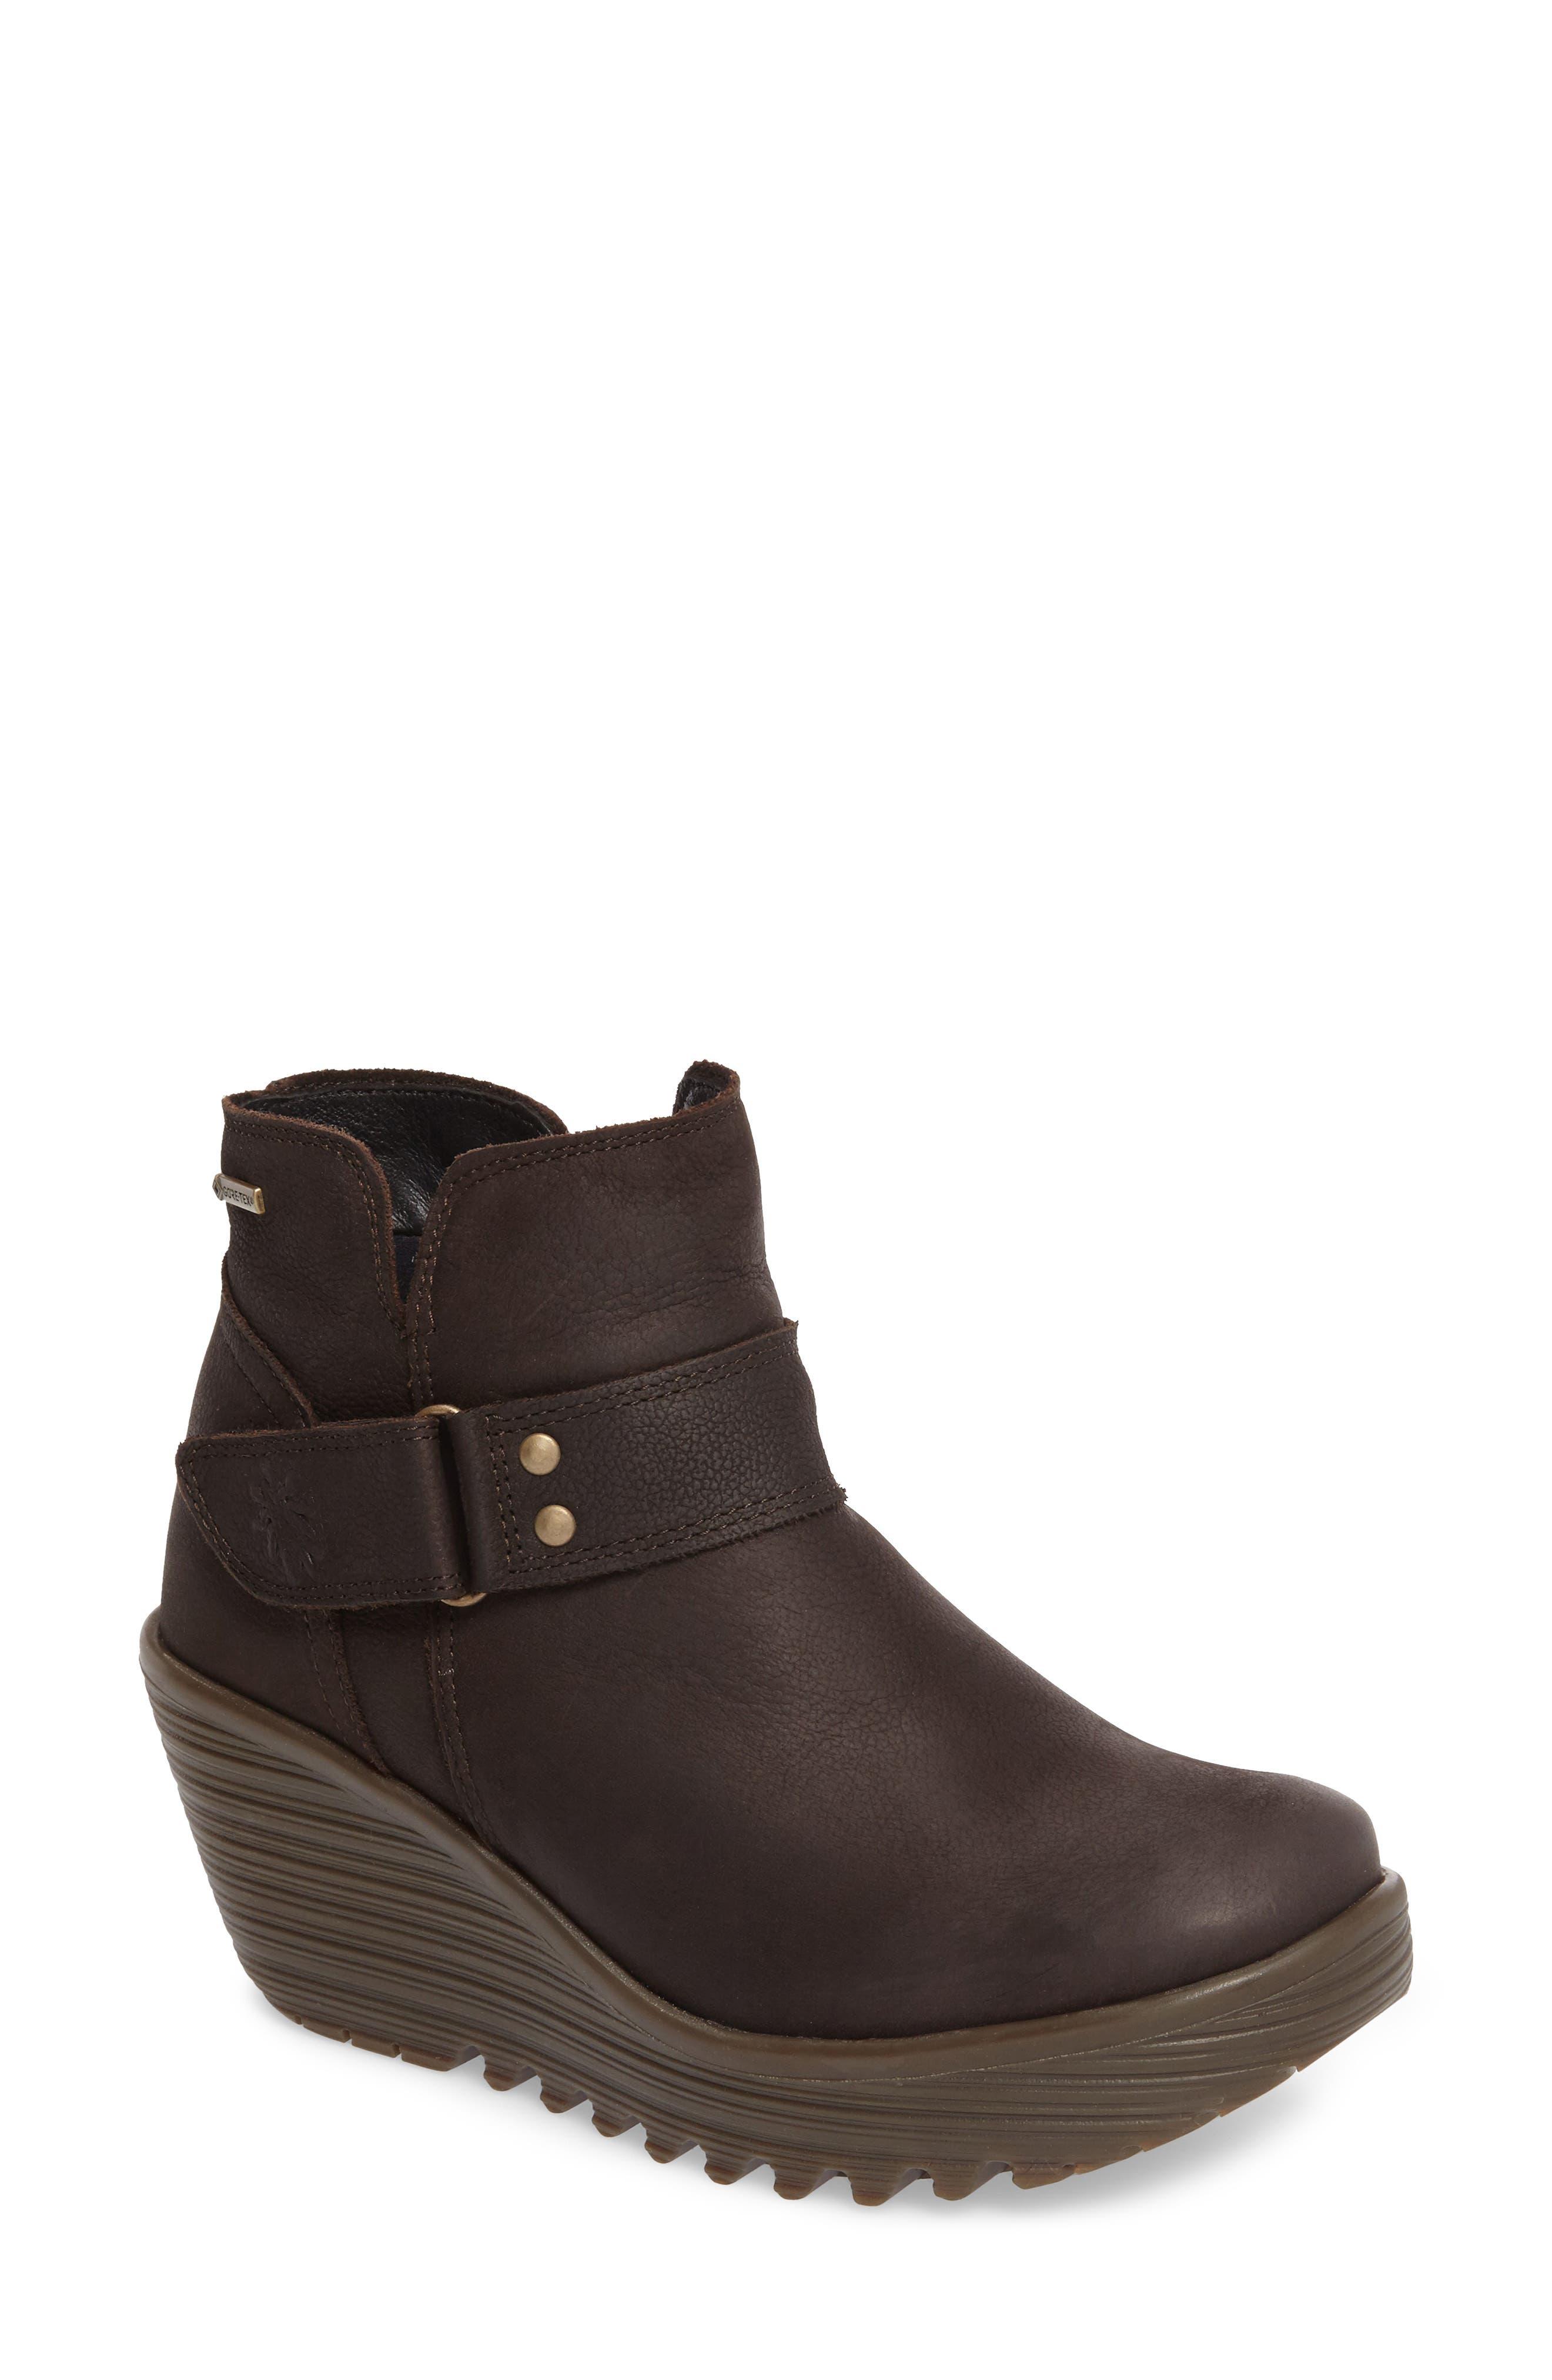 Main Image - Fly London Yock Waterproof Gore-Tex® Wedge Boot (Women)